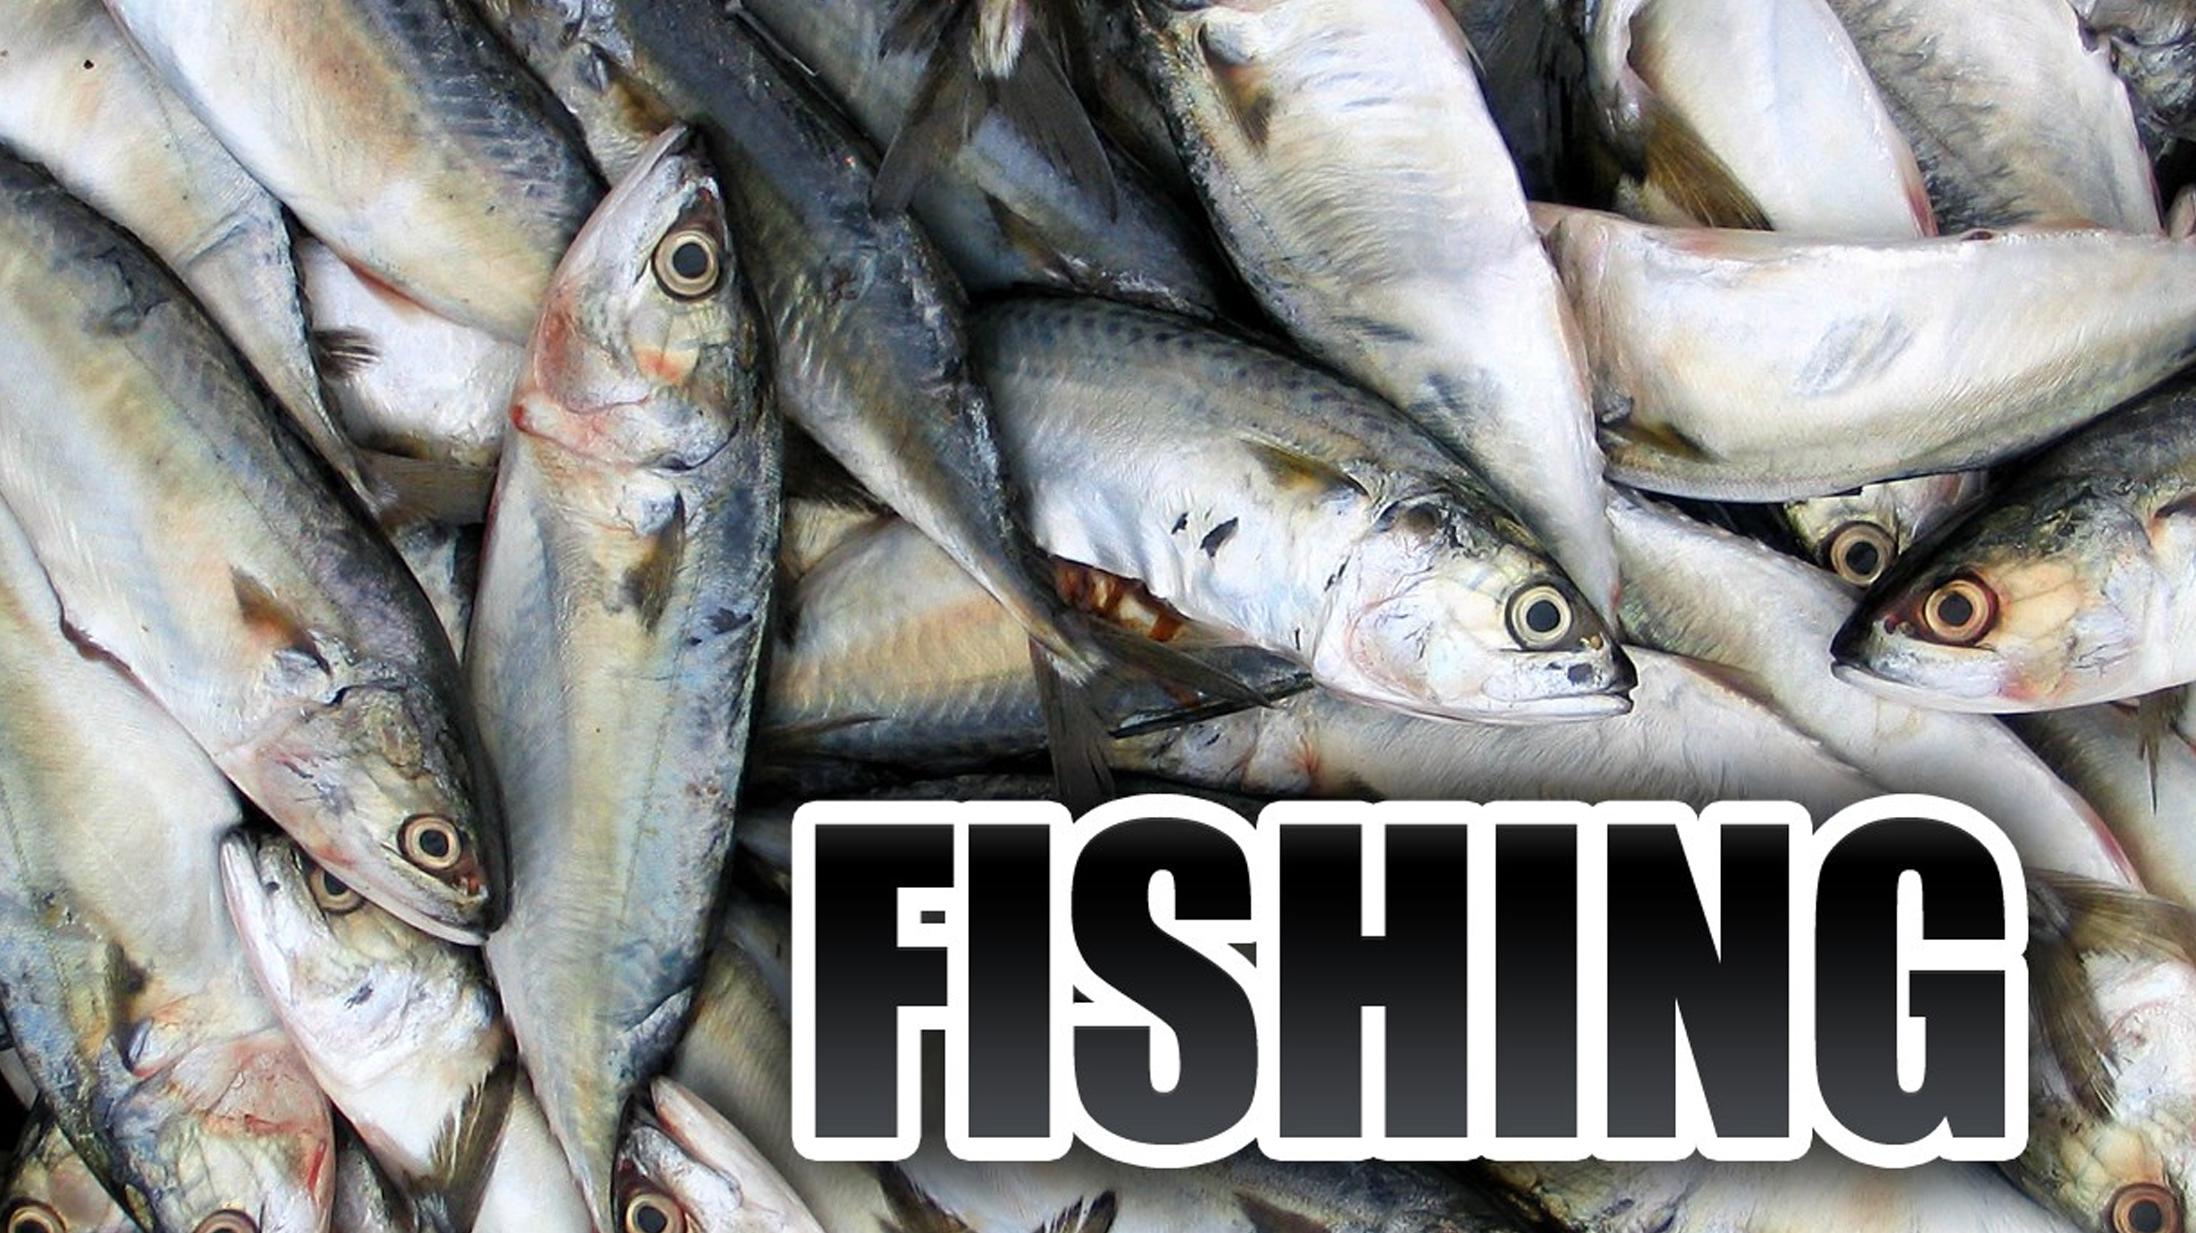 Fishing Generic FOR WEB_1460154020782.jpg